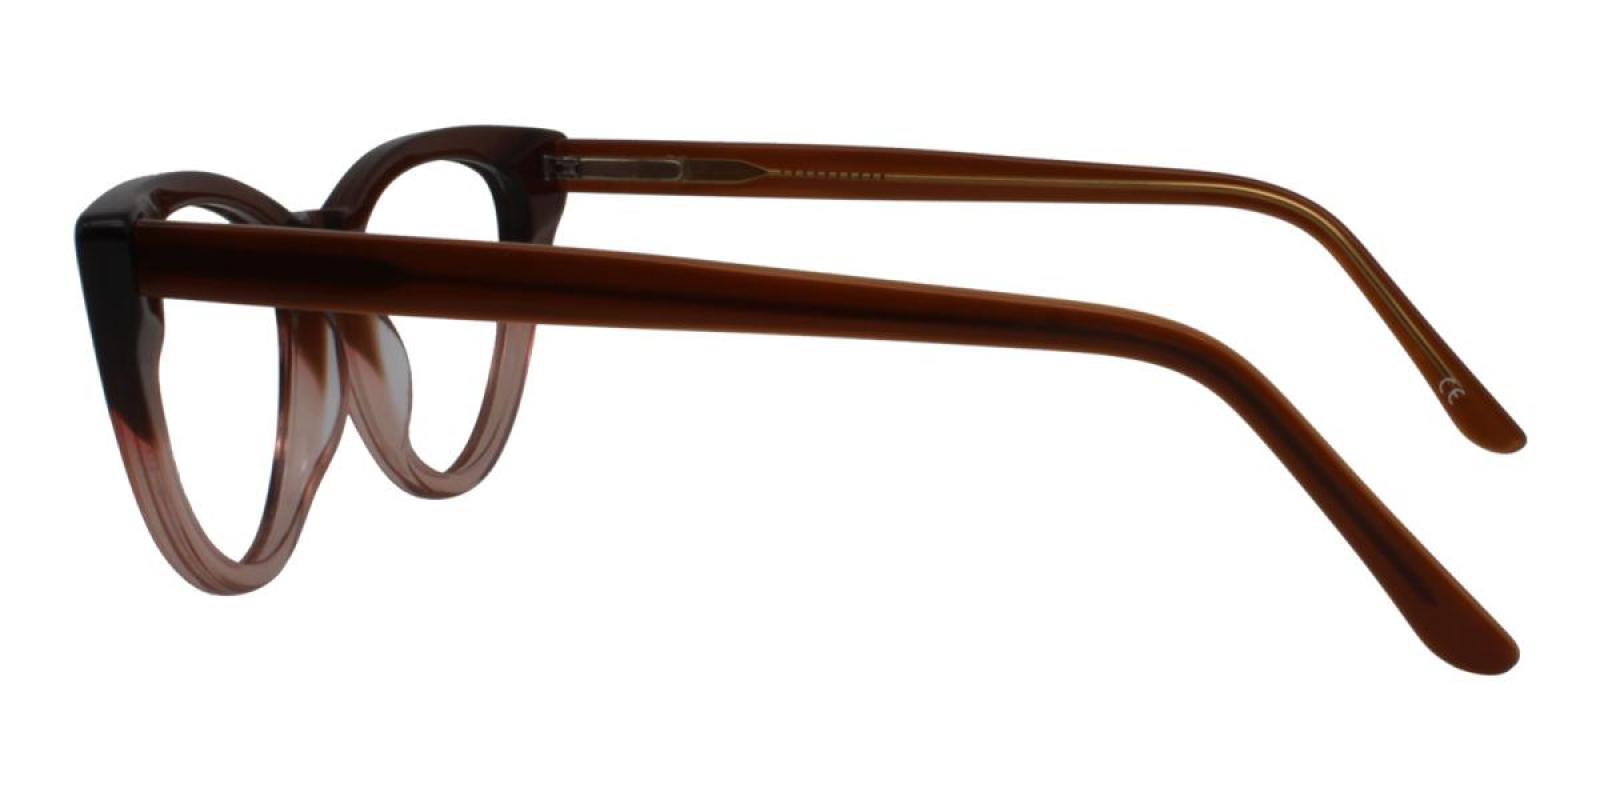 Charm-Brown-Cat-Acetate-Eyeglasses-additional3